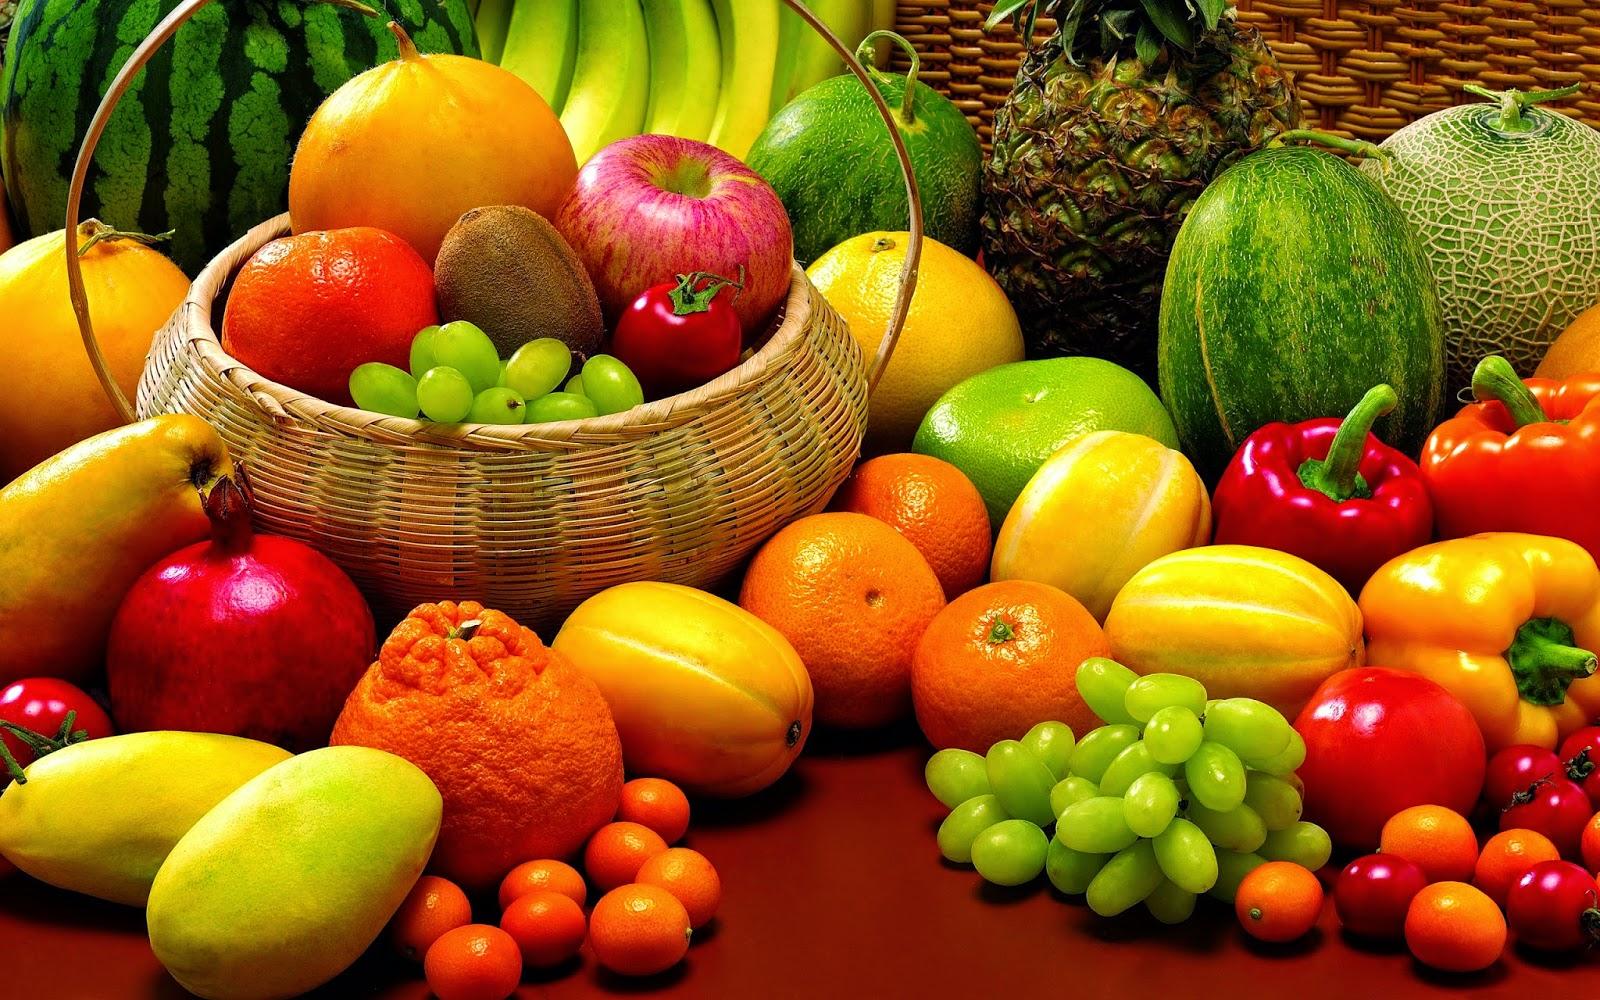 Apa Manfaat Jeruk, Apel, Pisang, Pepaya?